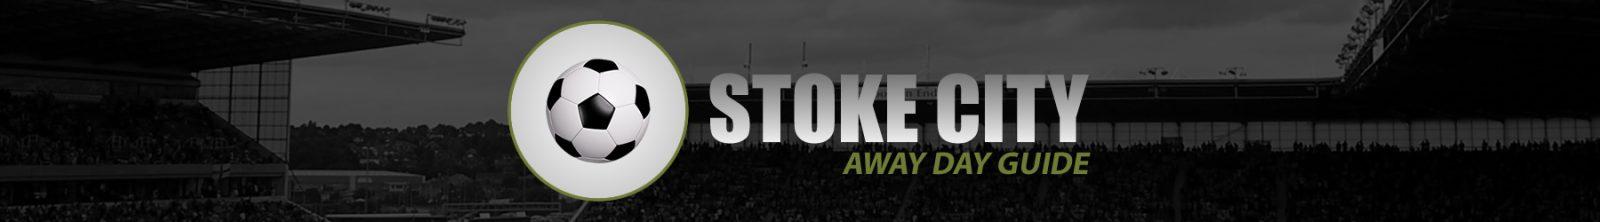 Stoke City Away